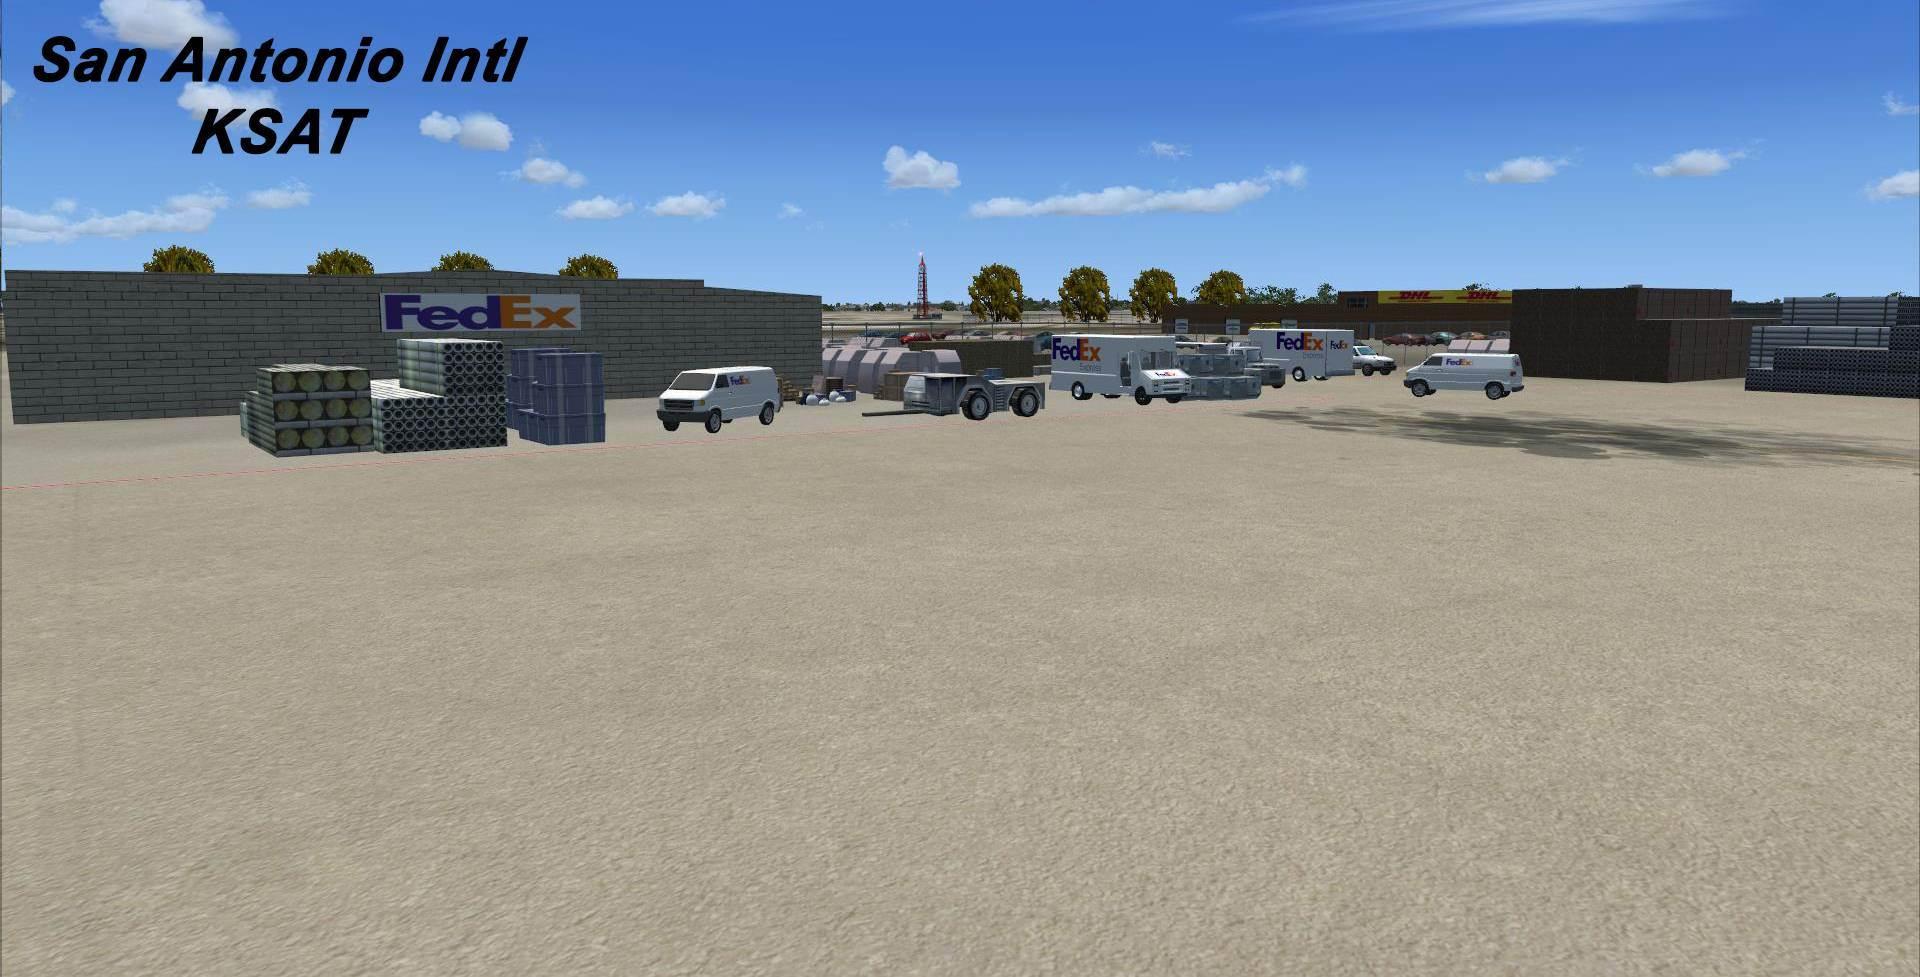 San Antonio International Airport Ksat